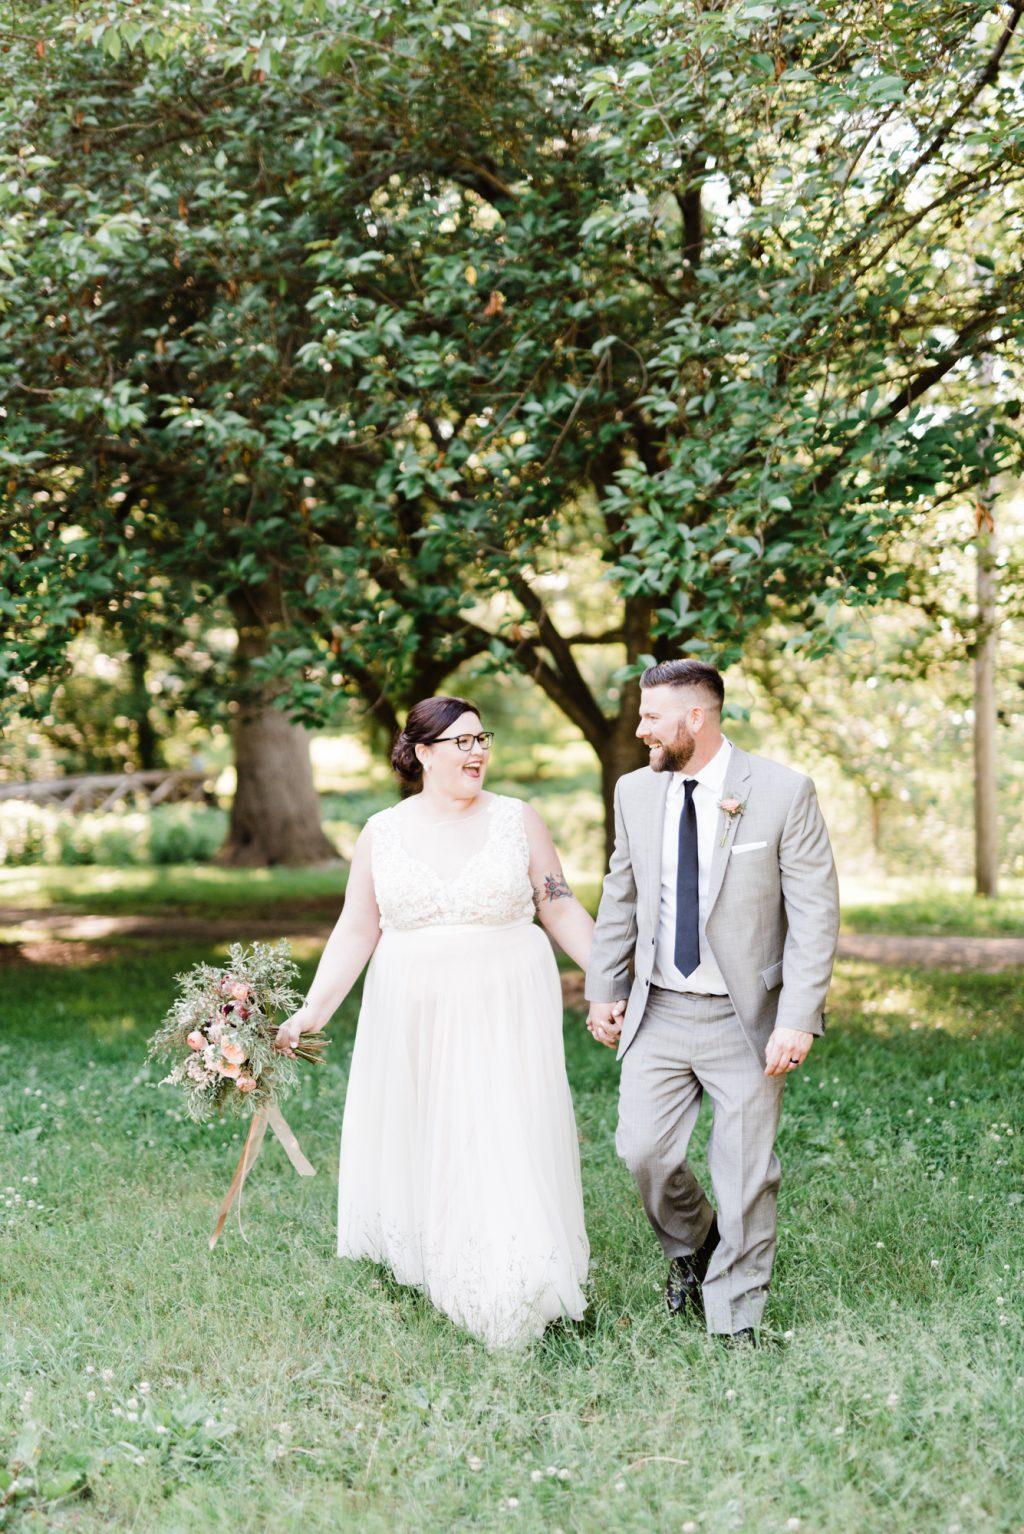 haley-richter-photo-west-chester-summer-wedding-boxcar-brewery-151